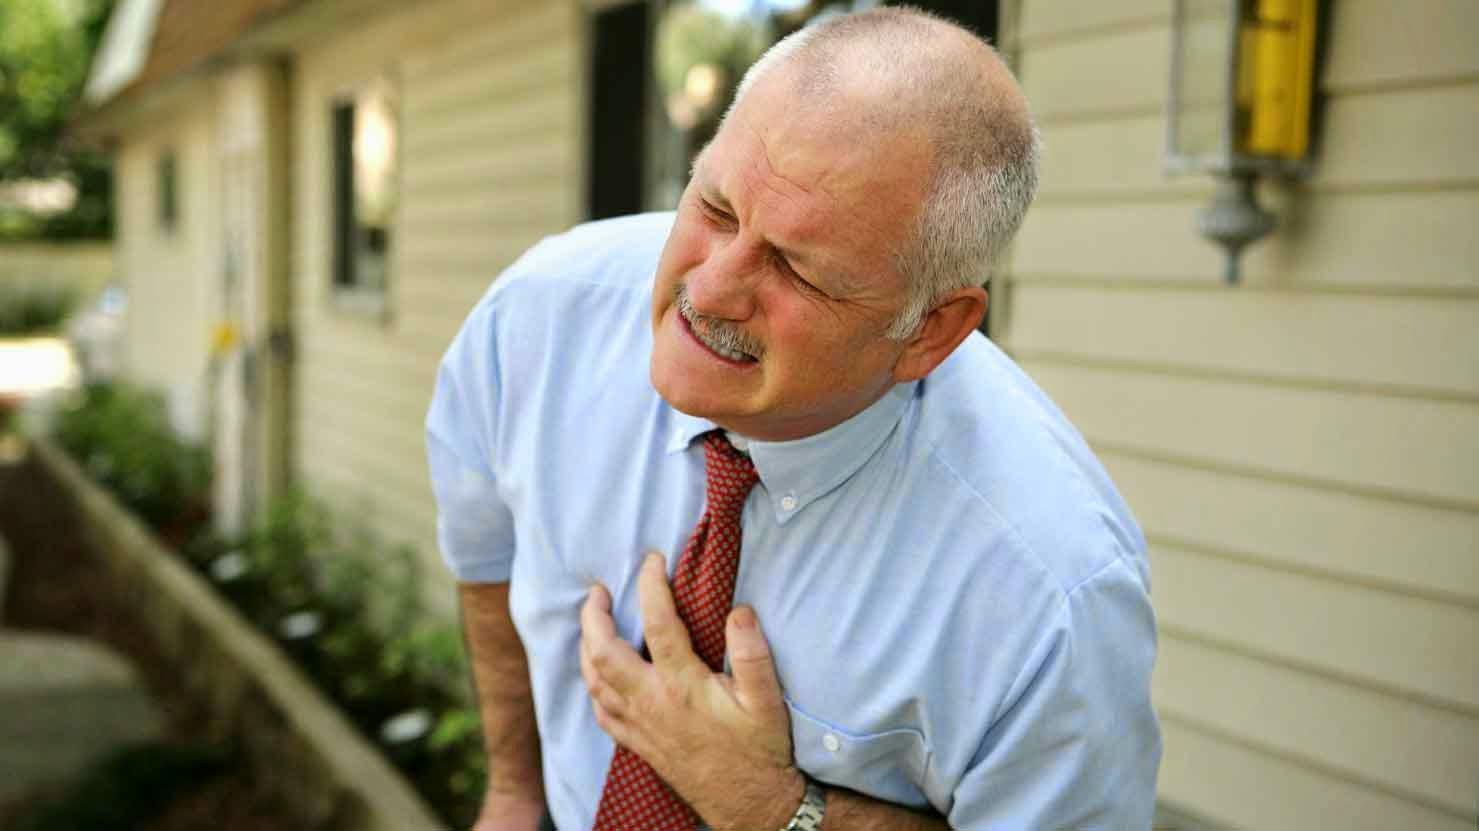 5 Easy Natural Cures For Dyspnea